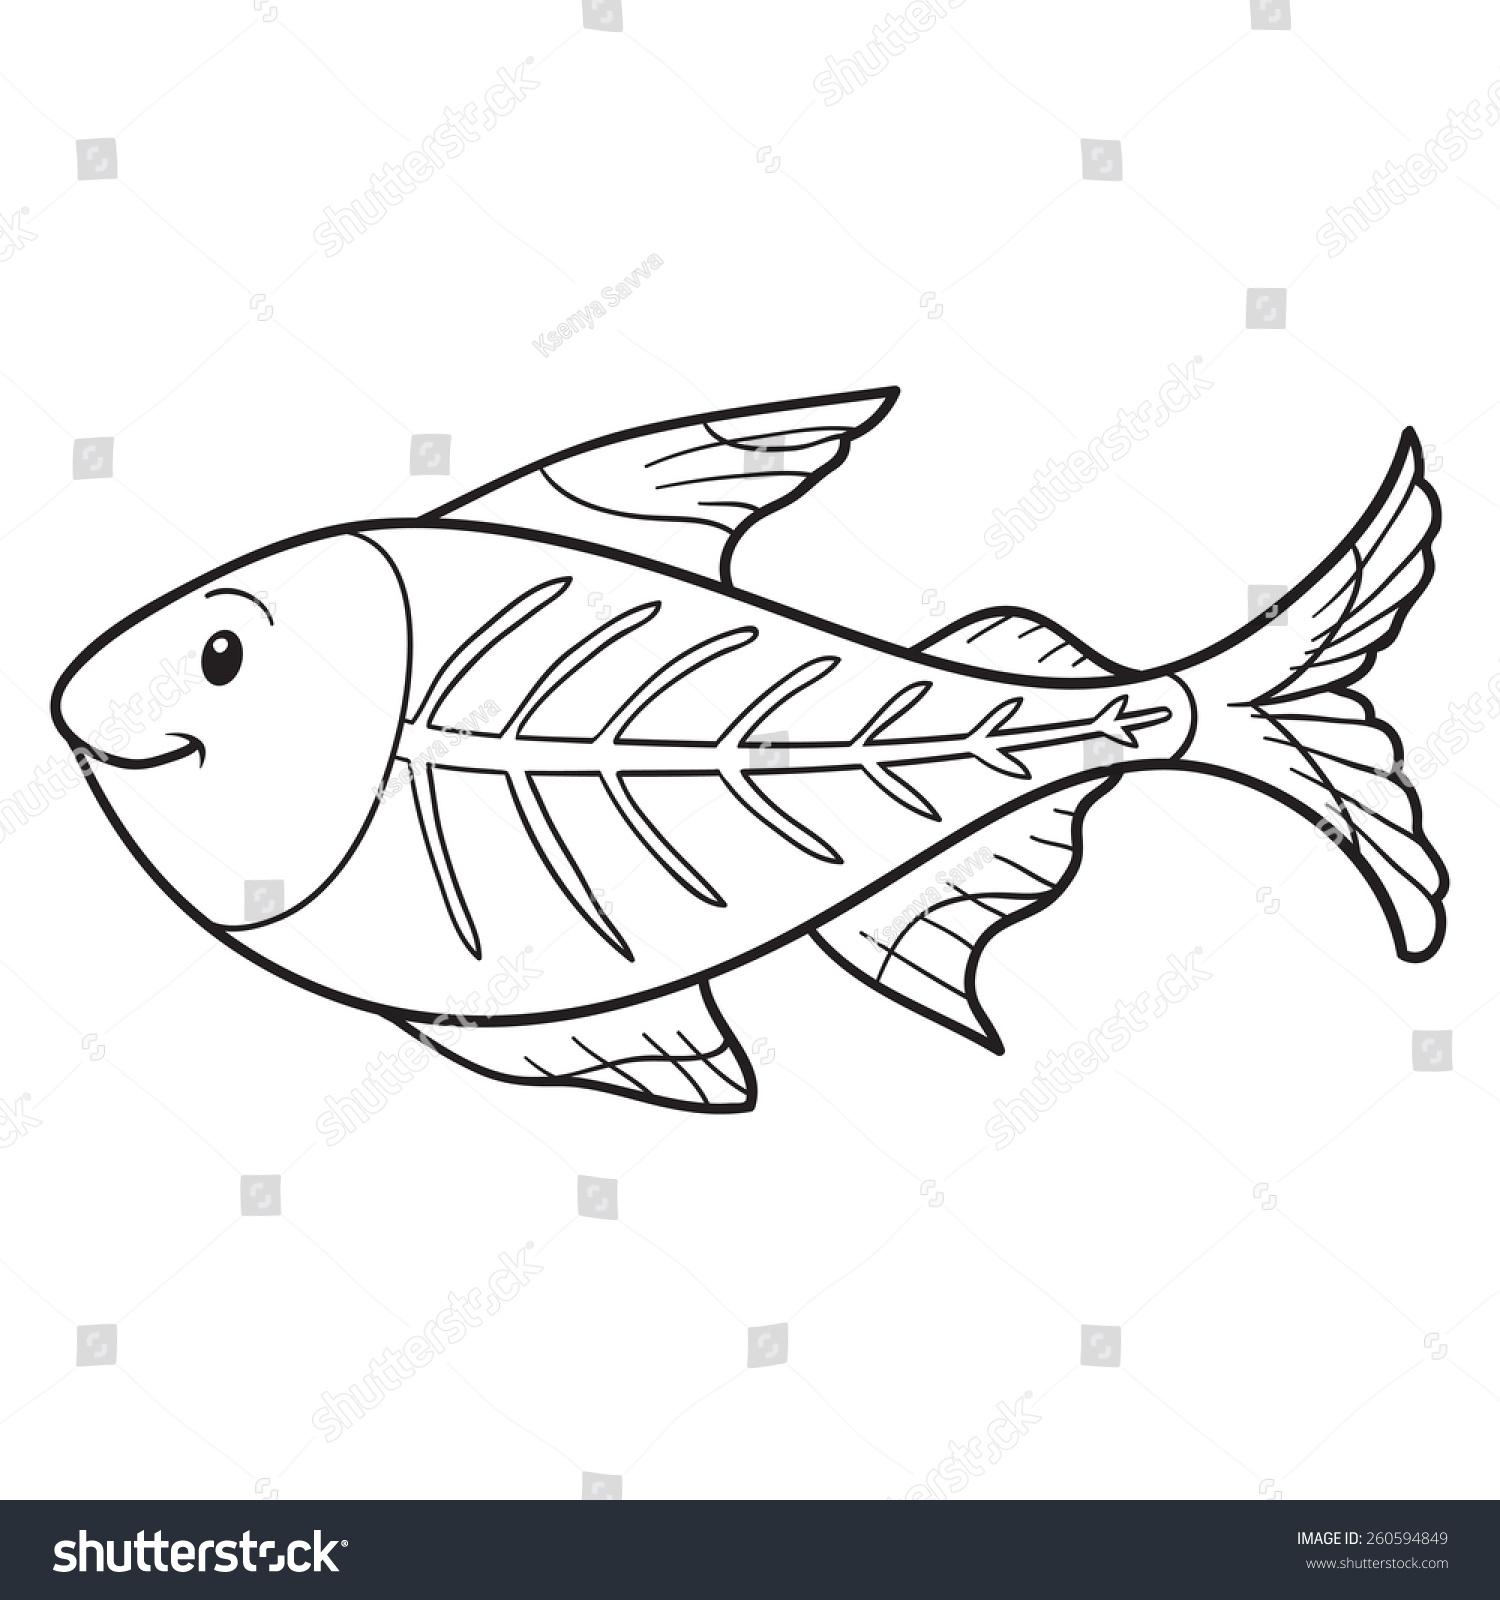 X ray printable coloring pages - X Ray Printable Coloring Pages Printable X Ray Coloring Pages Coloring Book Xray Fish Stock